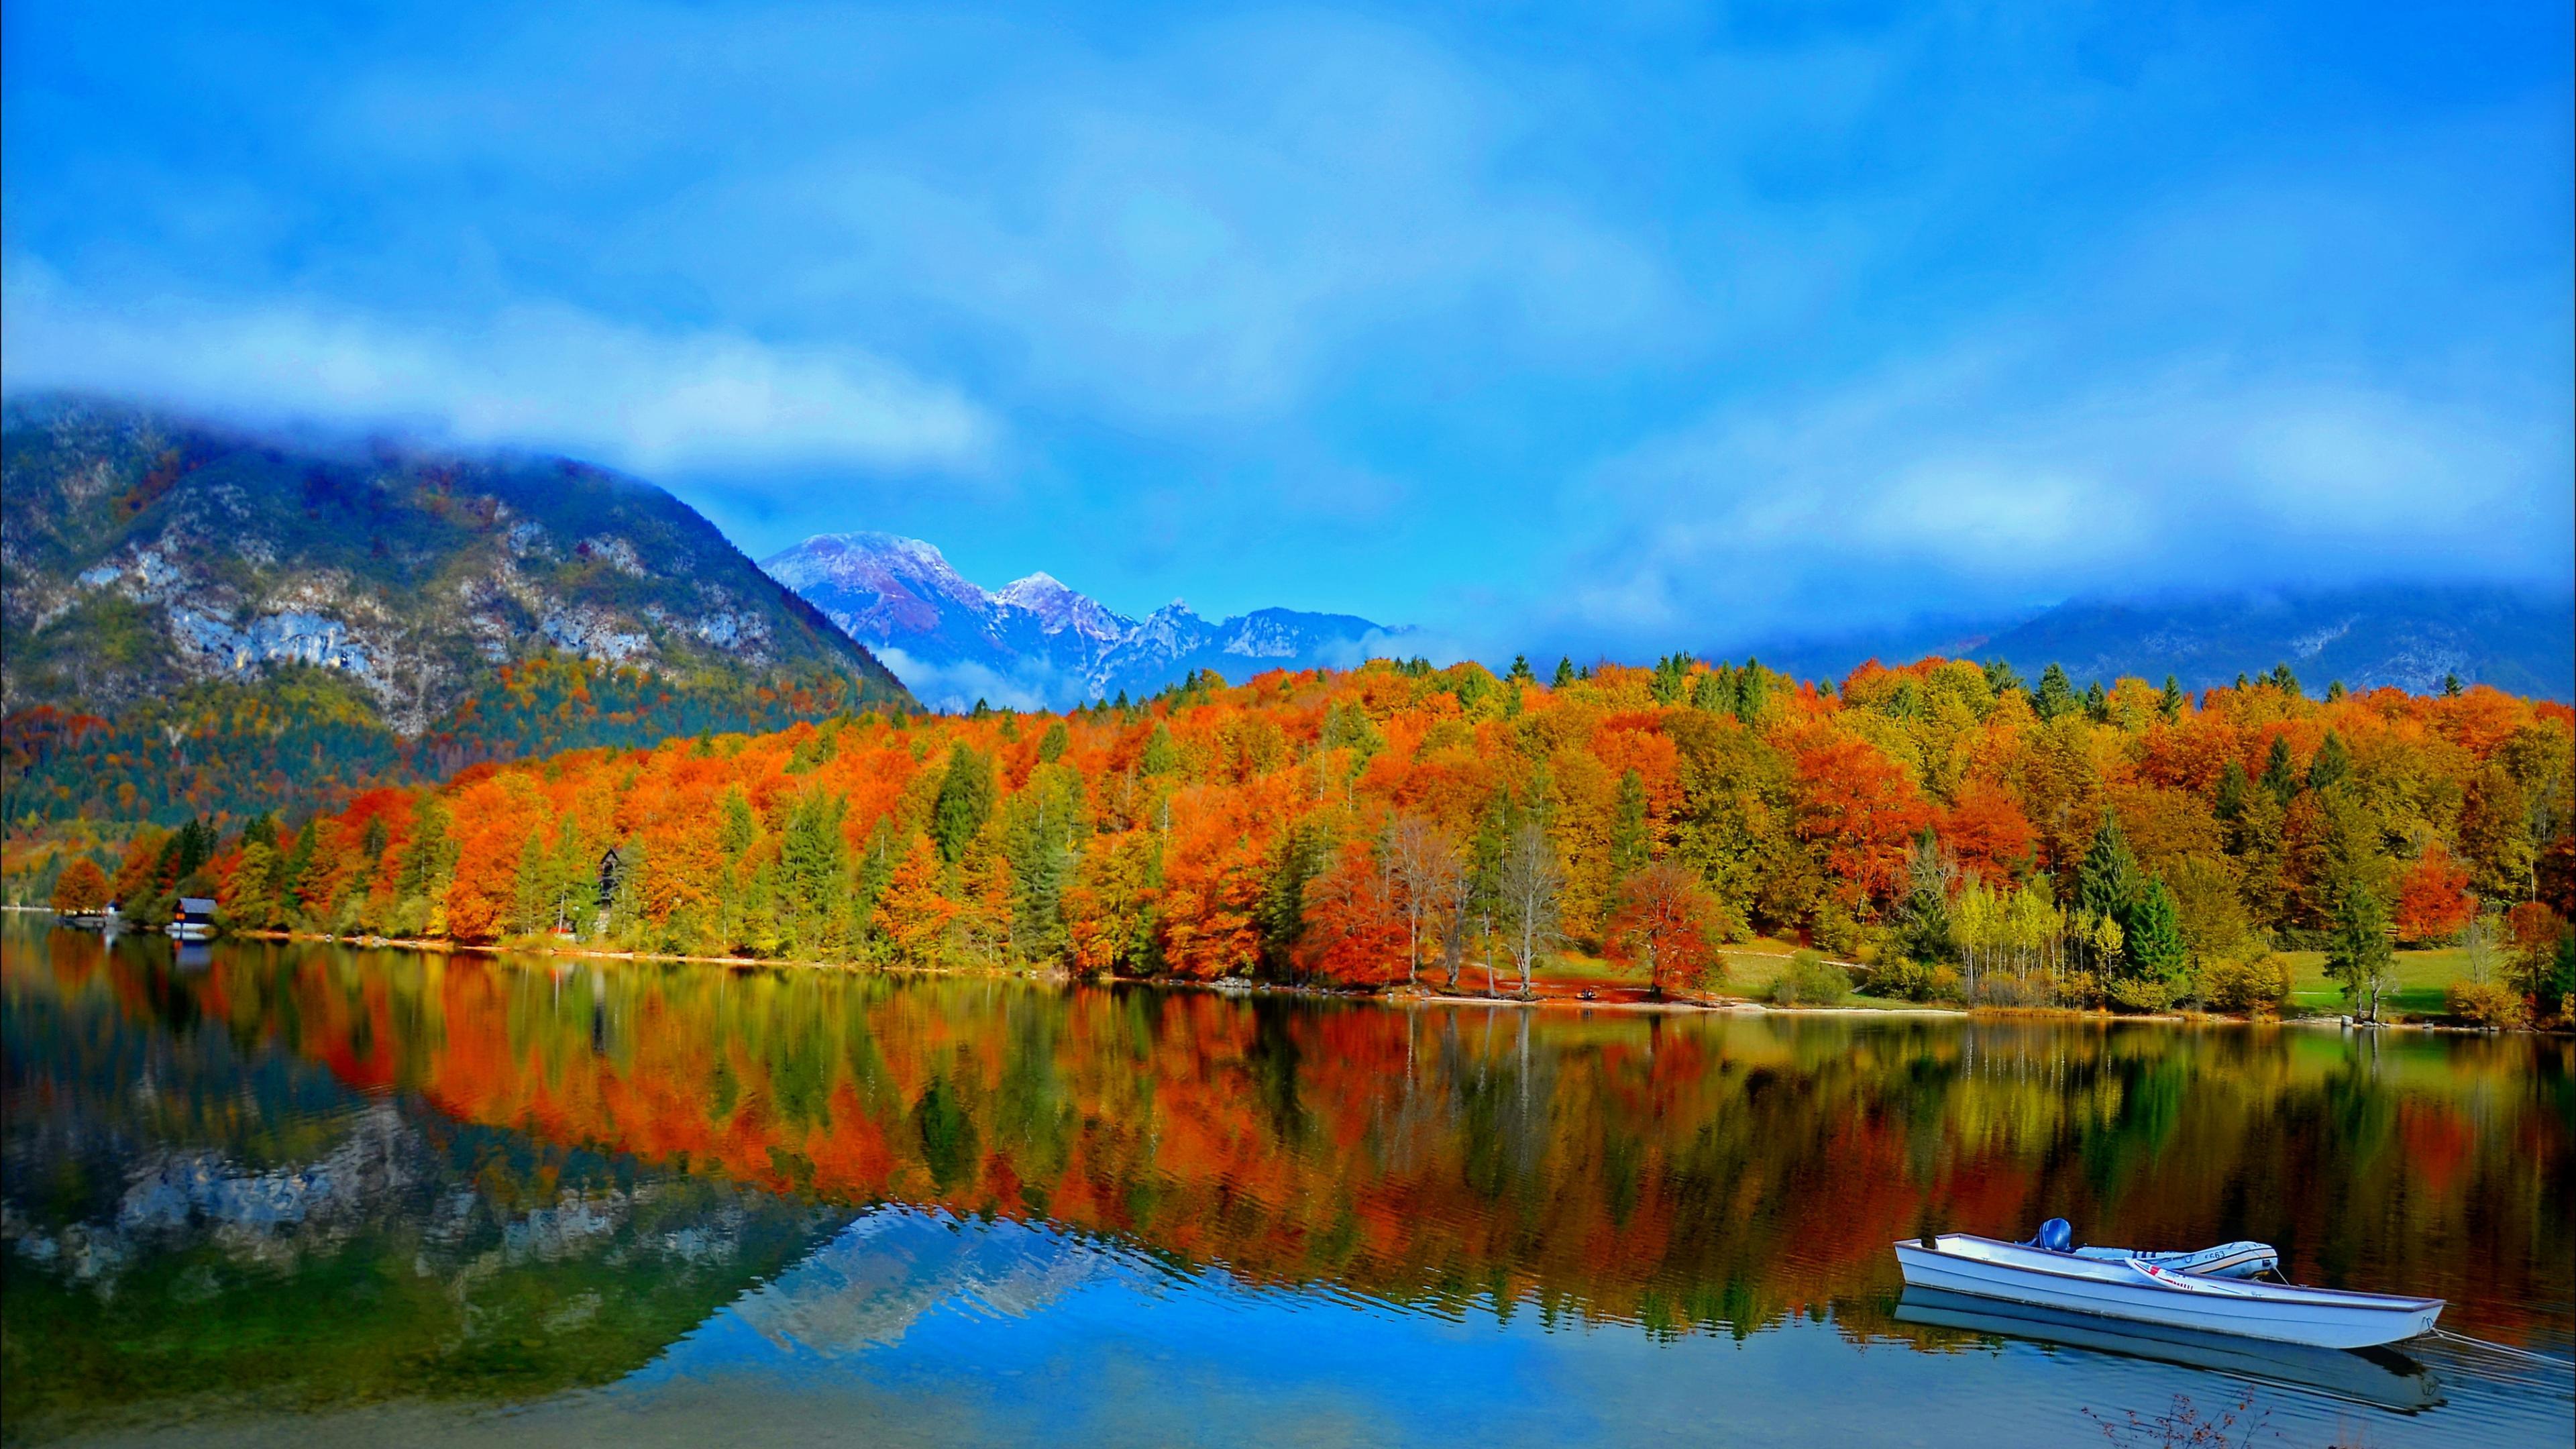 Earth Forest Tree Fall Foliage Mountain Cloud Lake Boat Wallpaper Resolution 3840x2160 Id 526490 Wallha Com